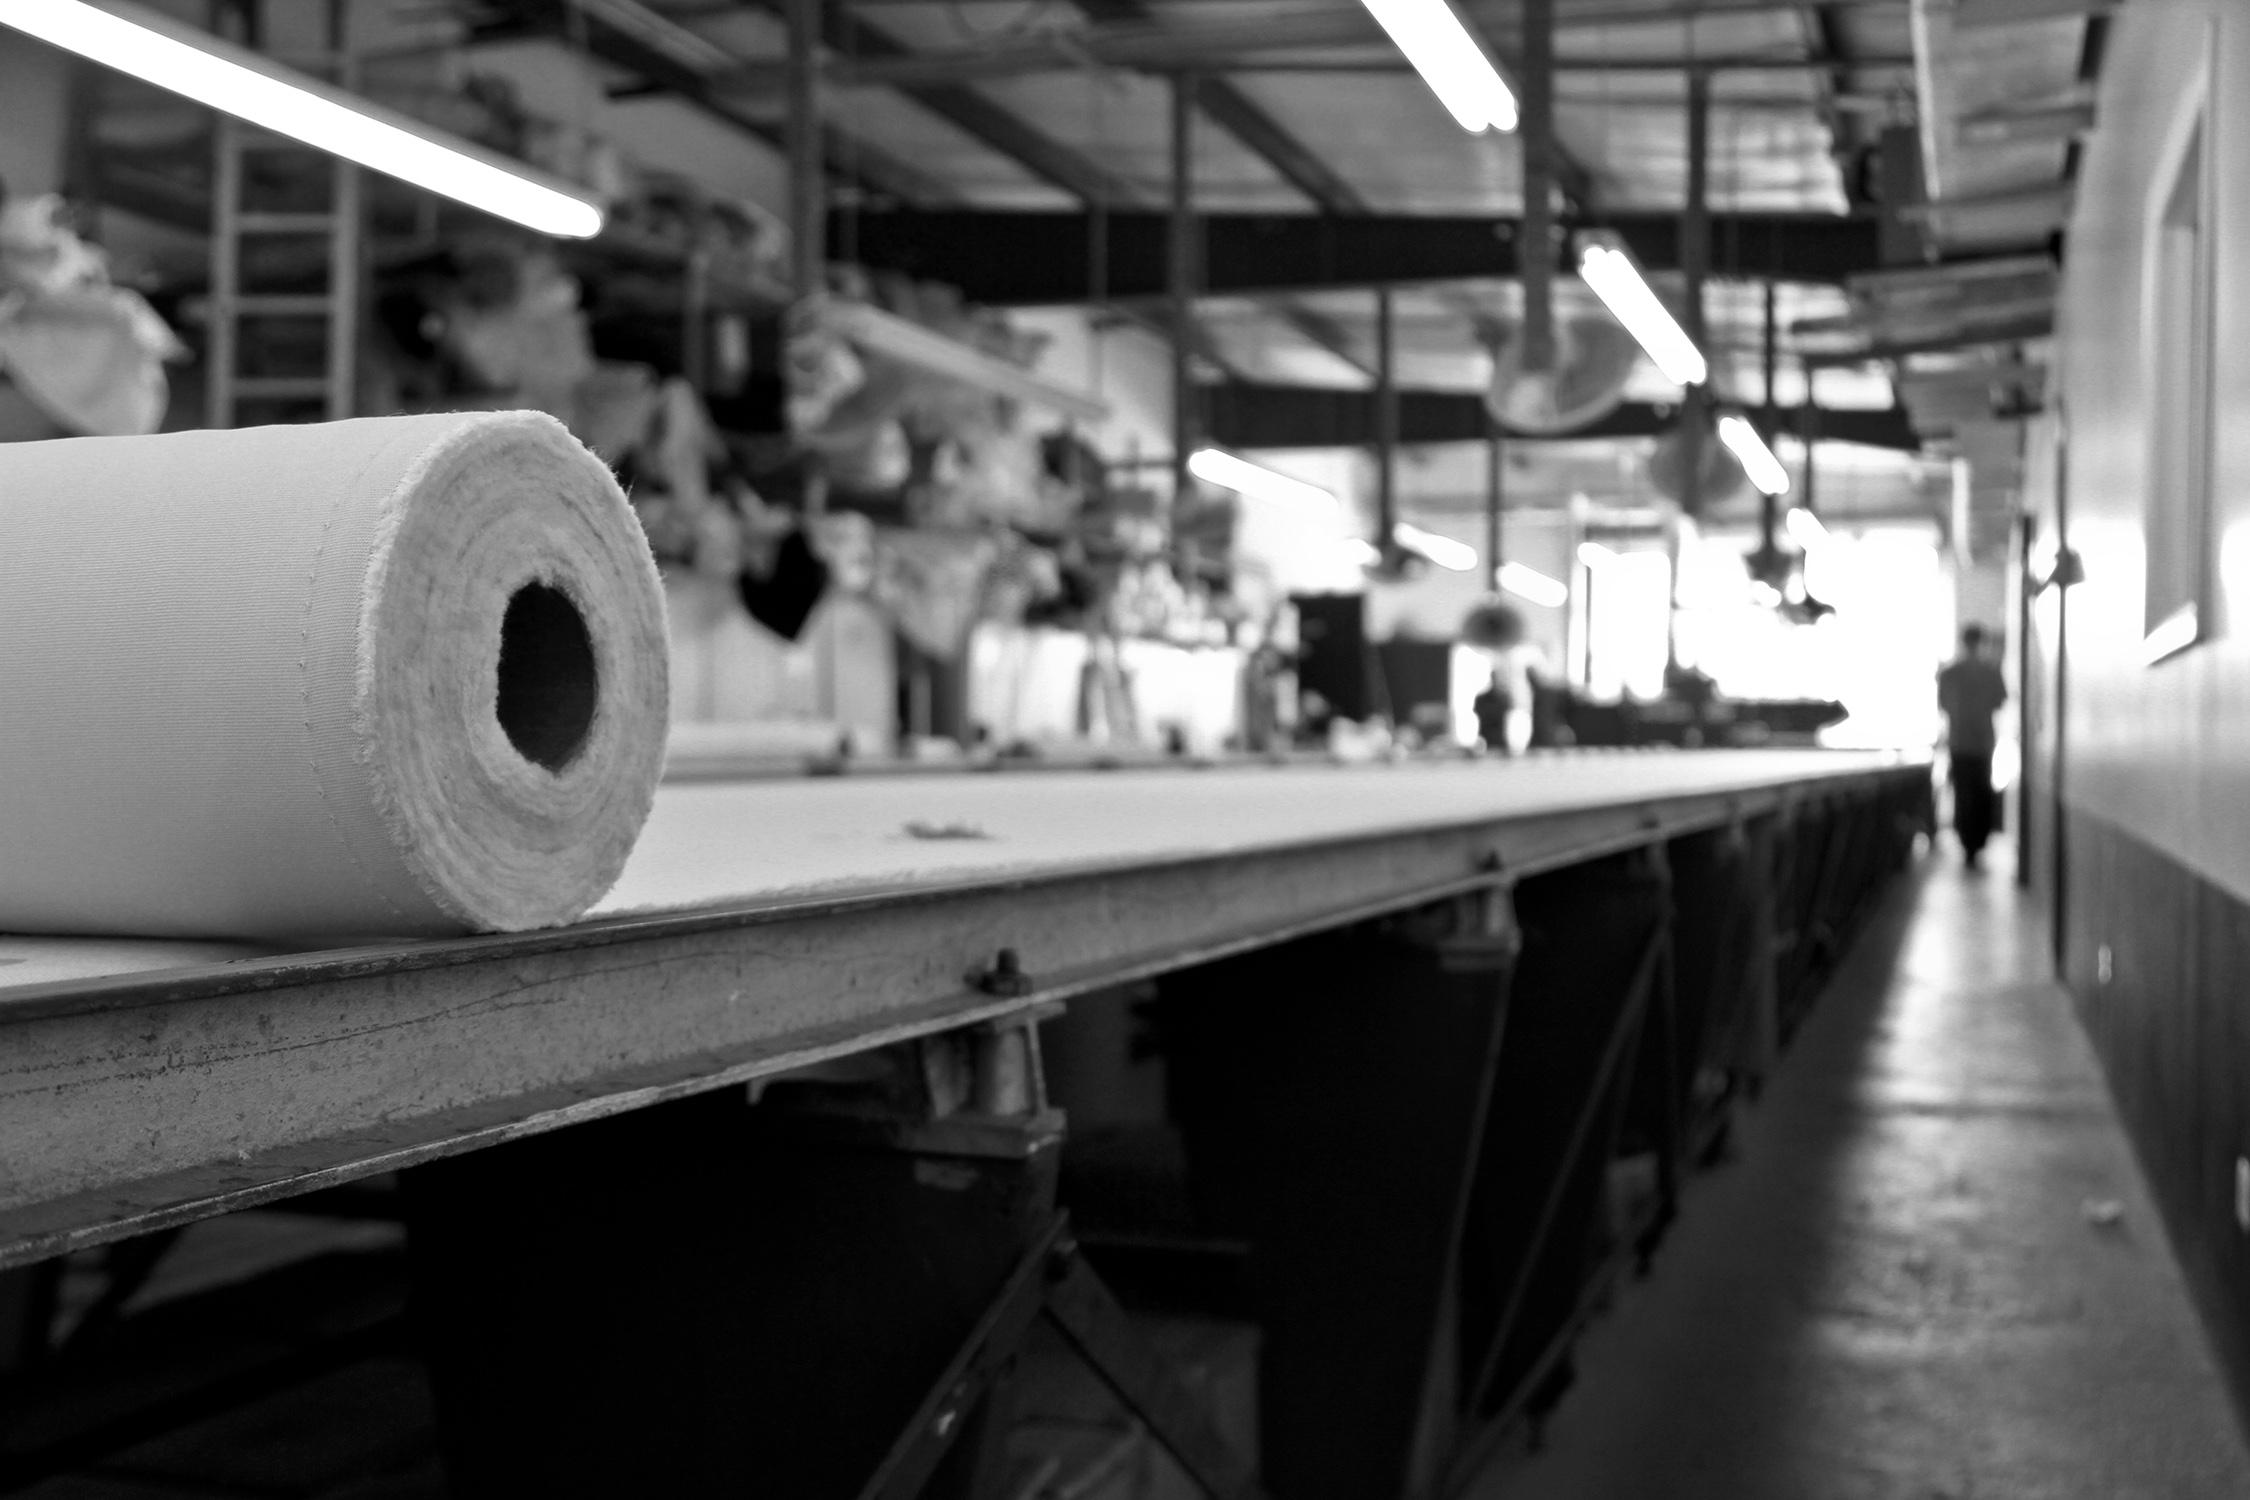 roll-of-fabric-on-printing-table-bahamahandprints-nassau-bahams copy.jpg